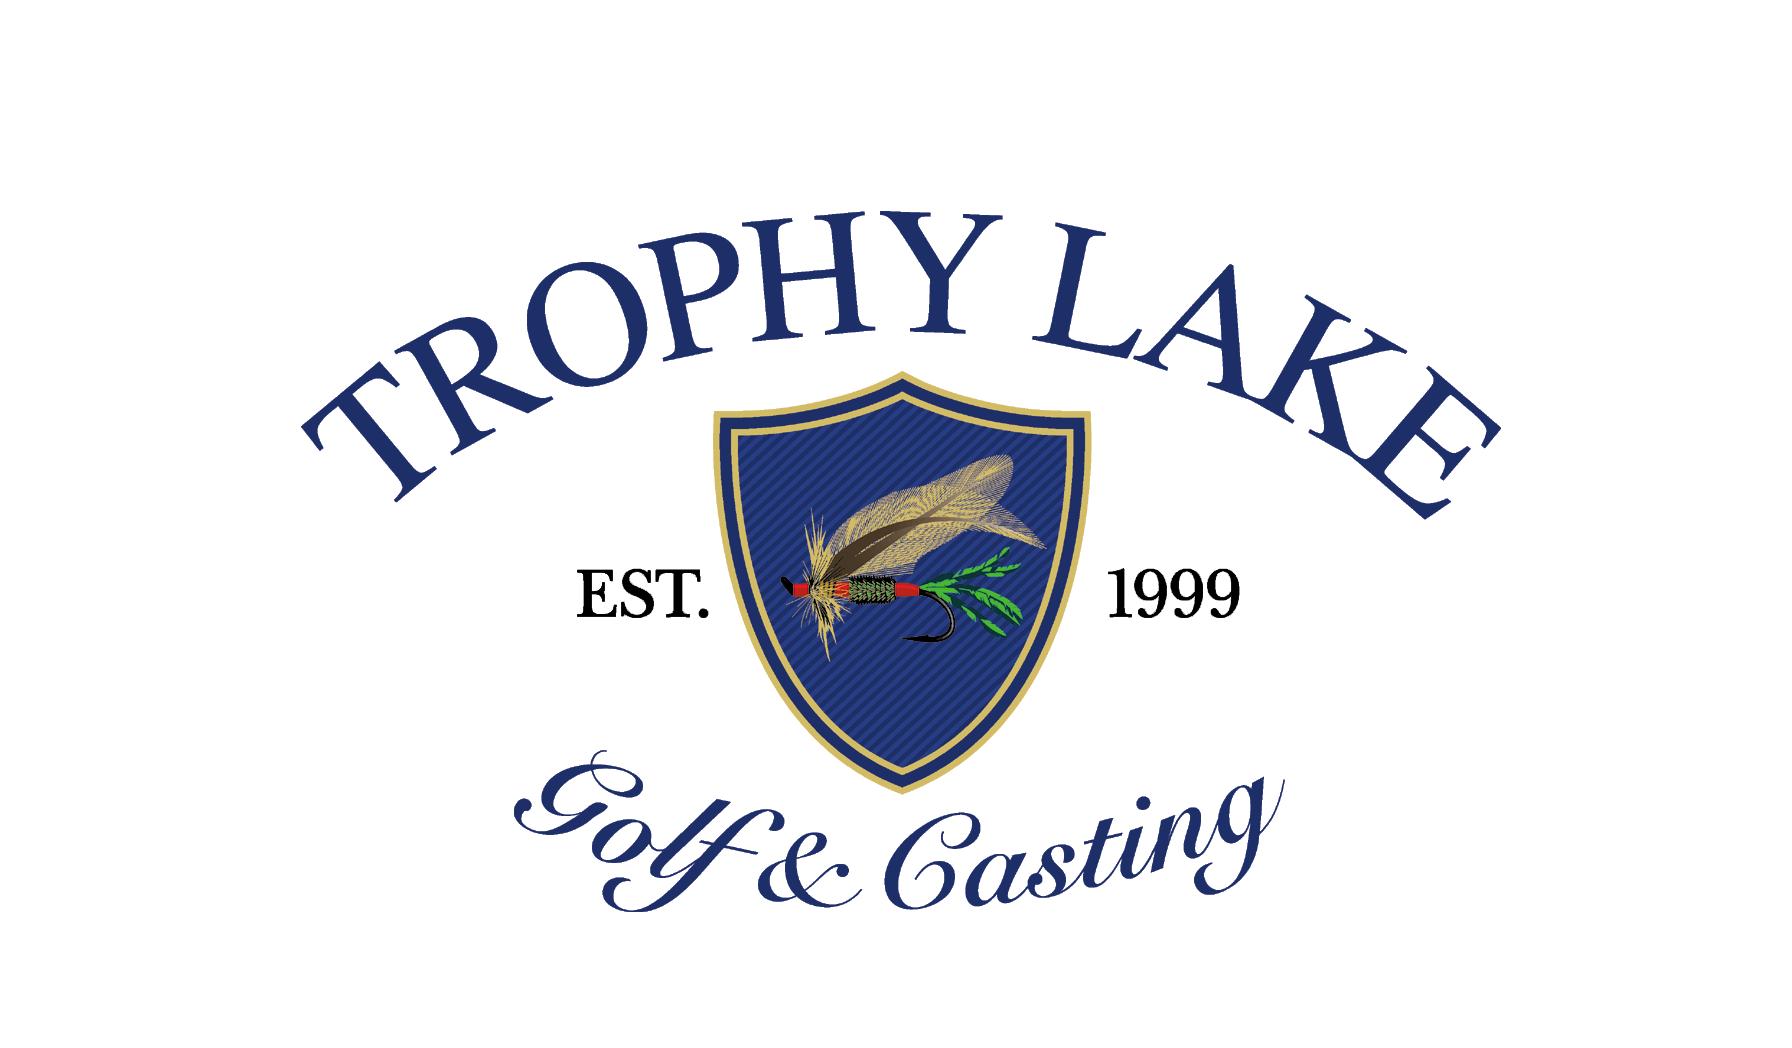 Trophy Lake Golf & Casting